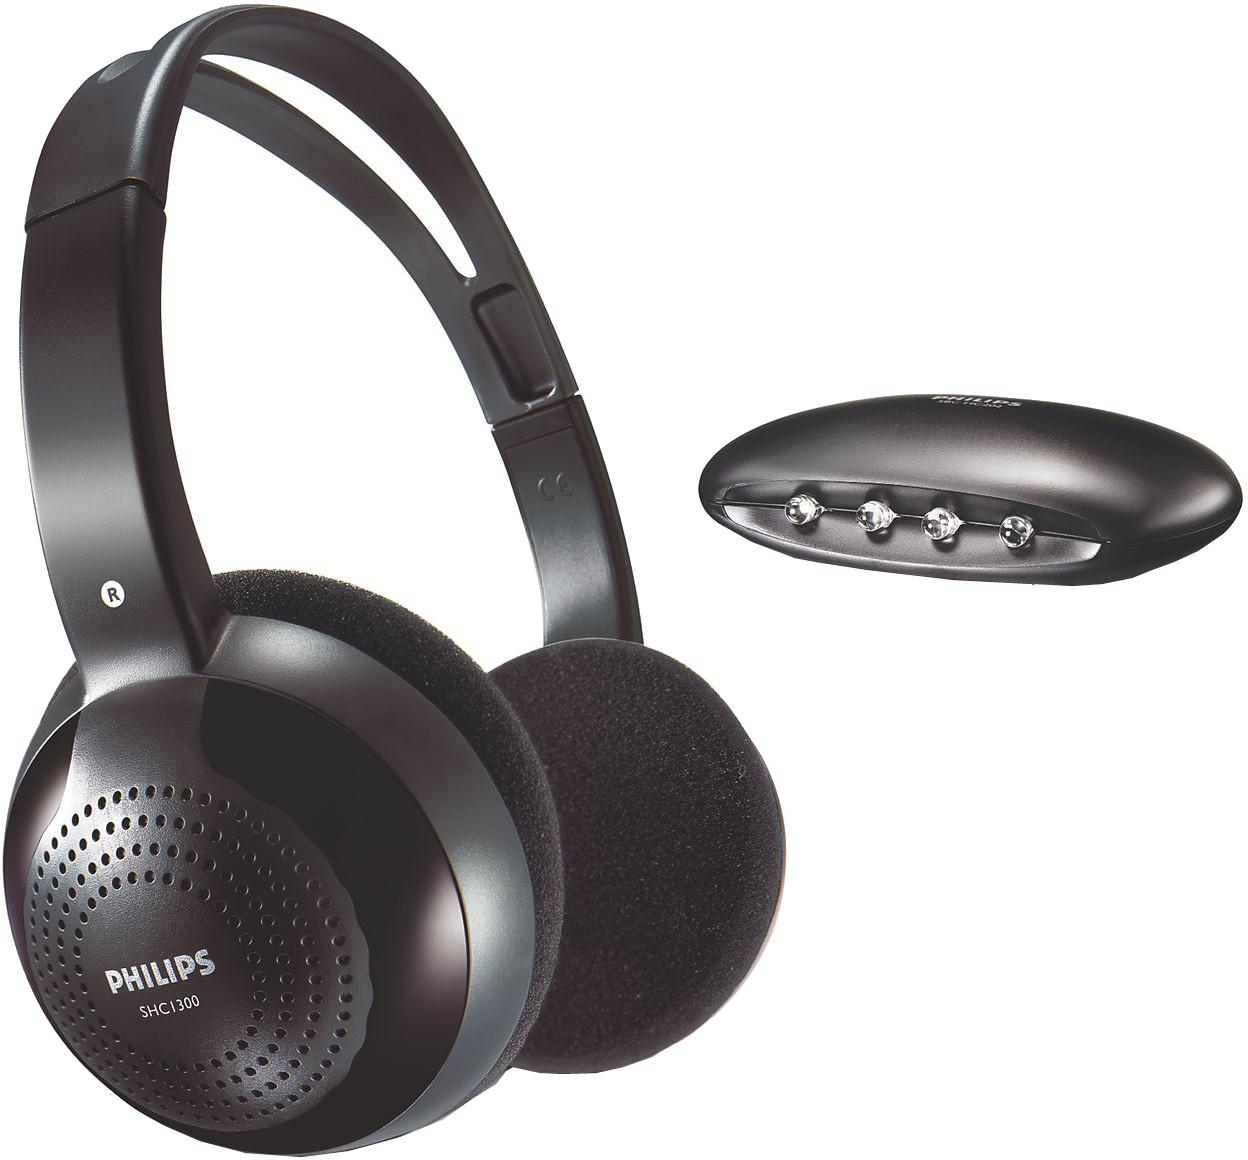 Philips SHC1300 Wireless Headphones Price In India